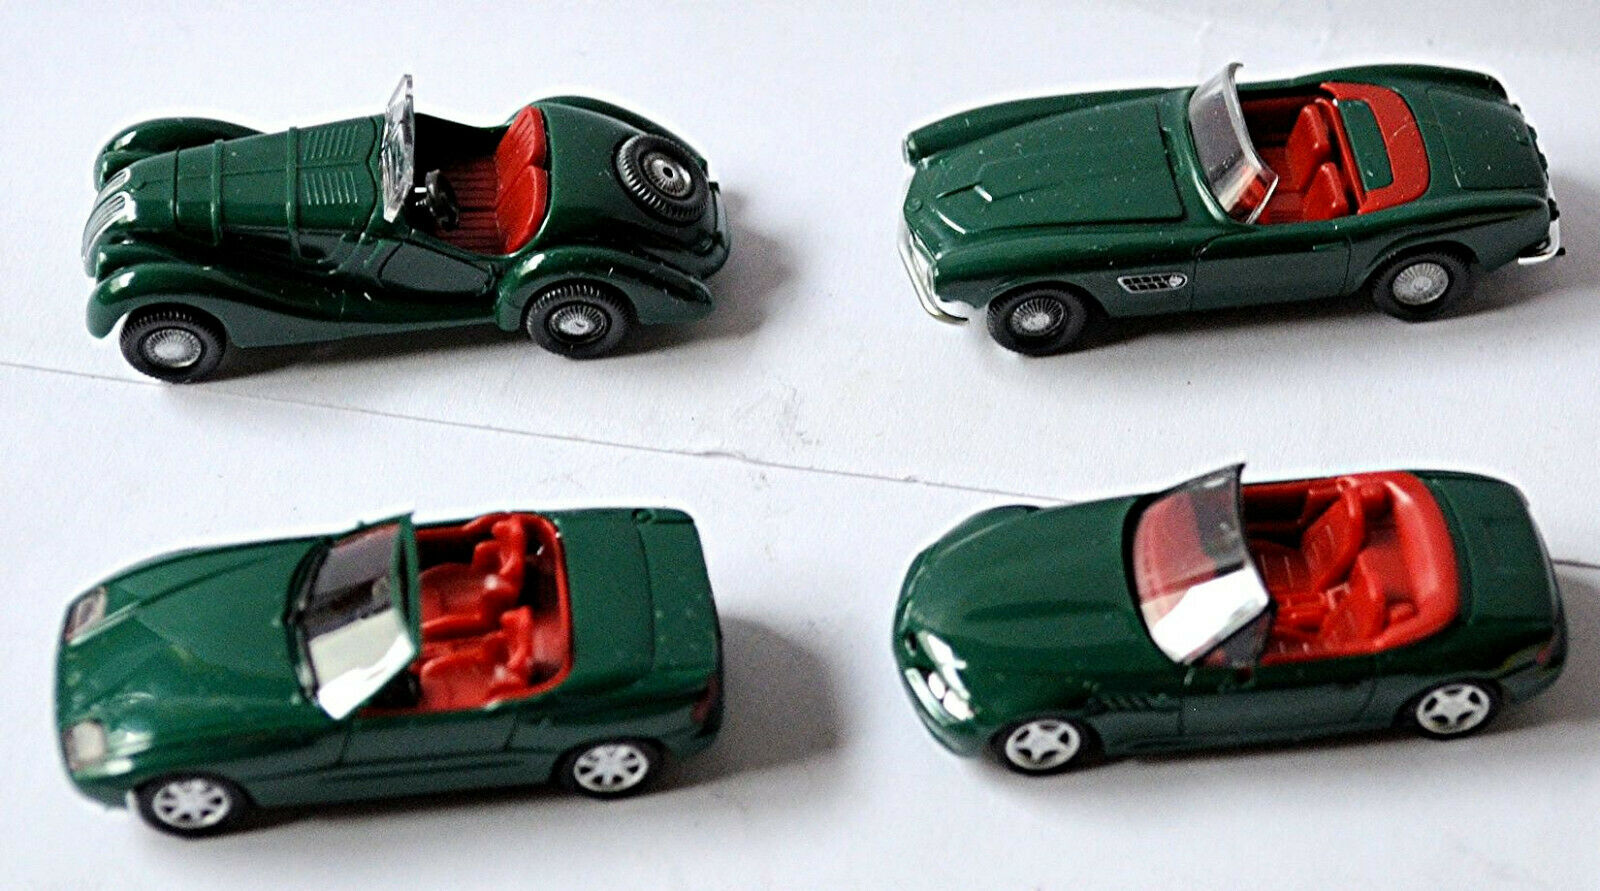 BMW Roadster 1936-1996 328 , 507 , Z1, Z3, 4 Camión Set Racing green 1 87 Herpa